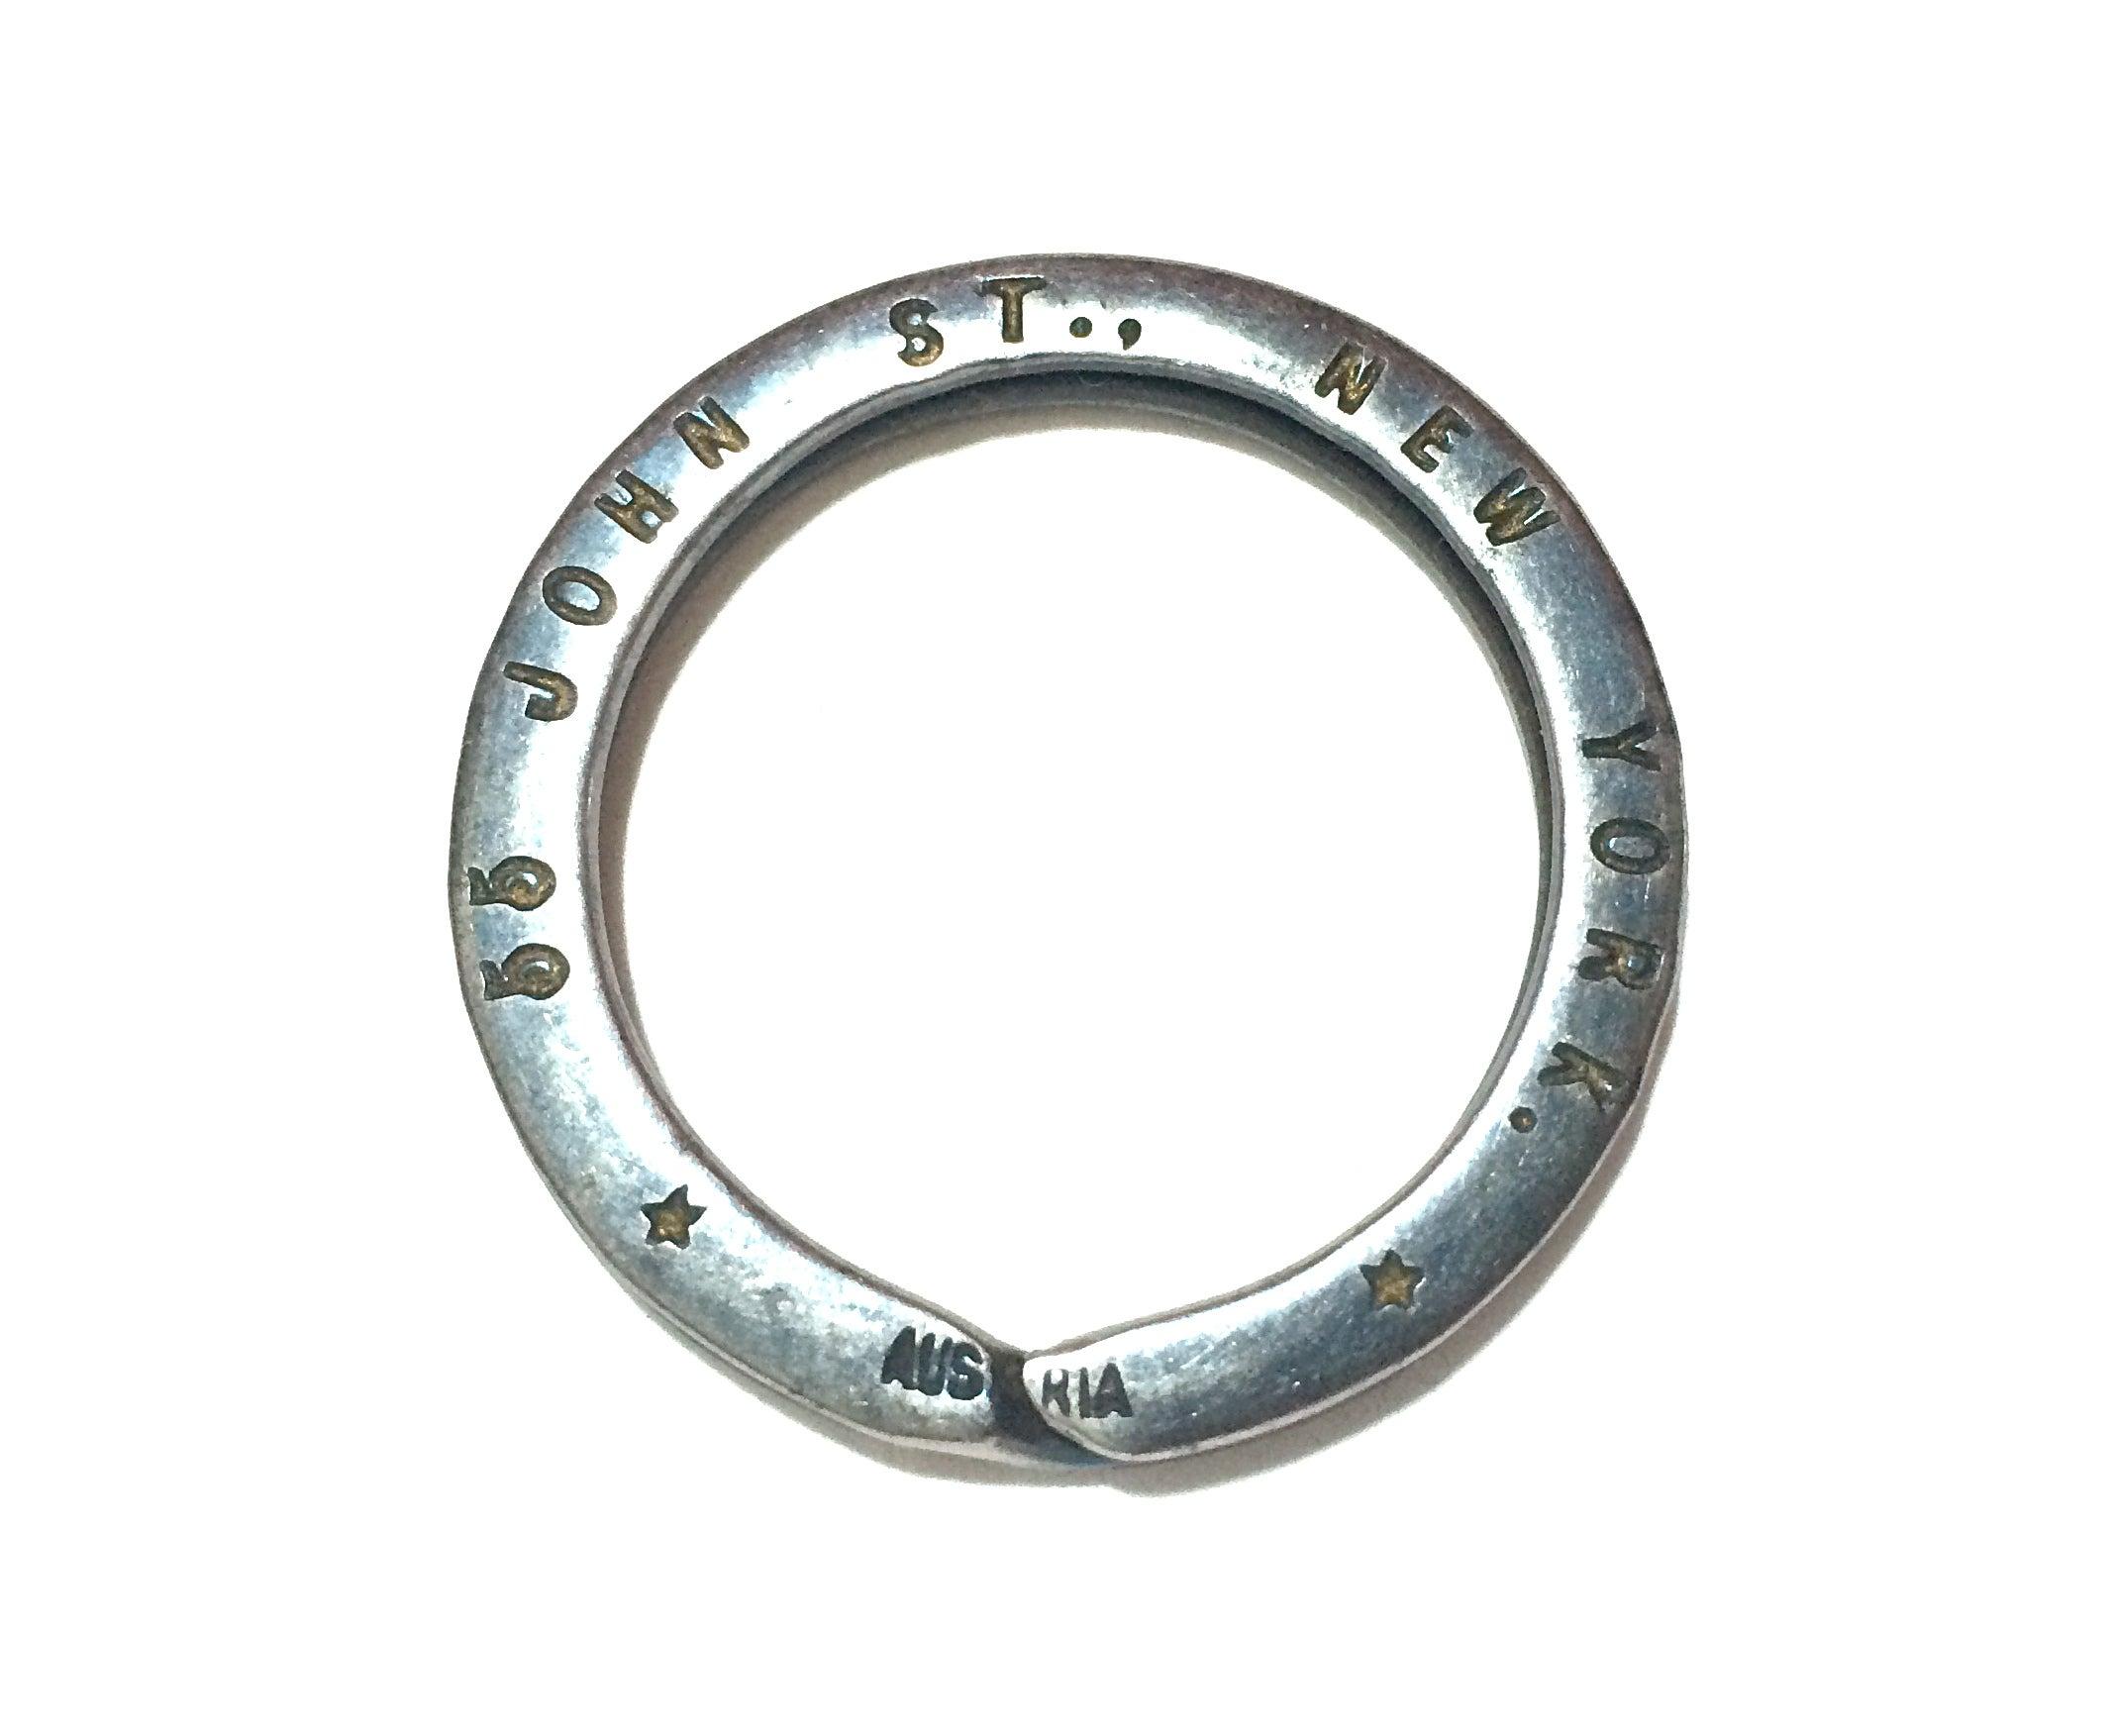 Image of 1920's split key ring